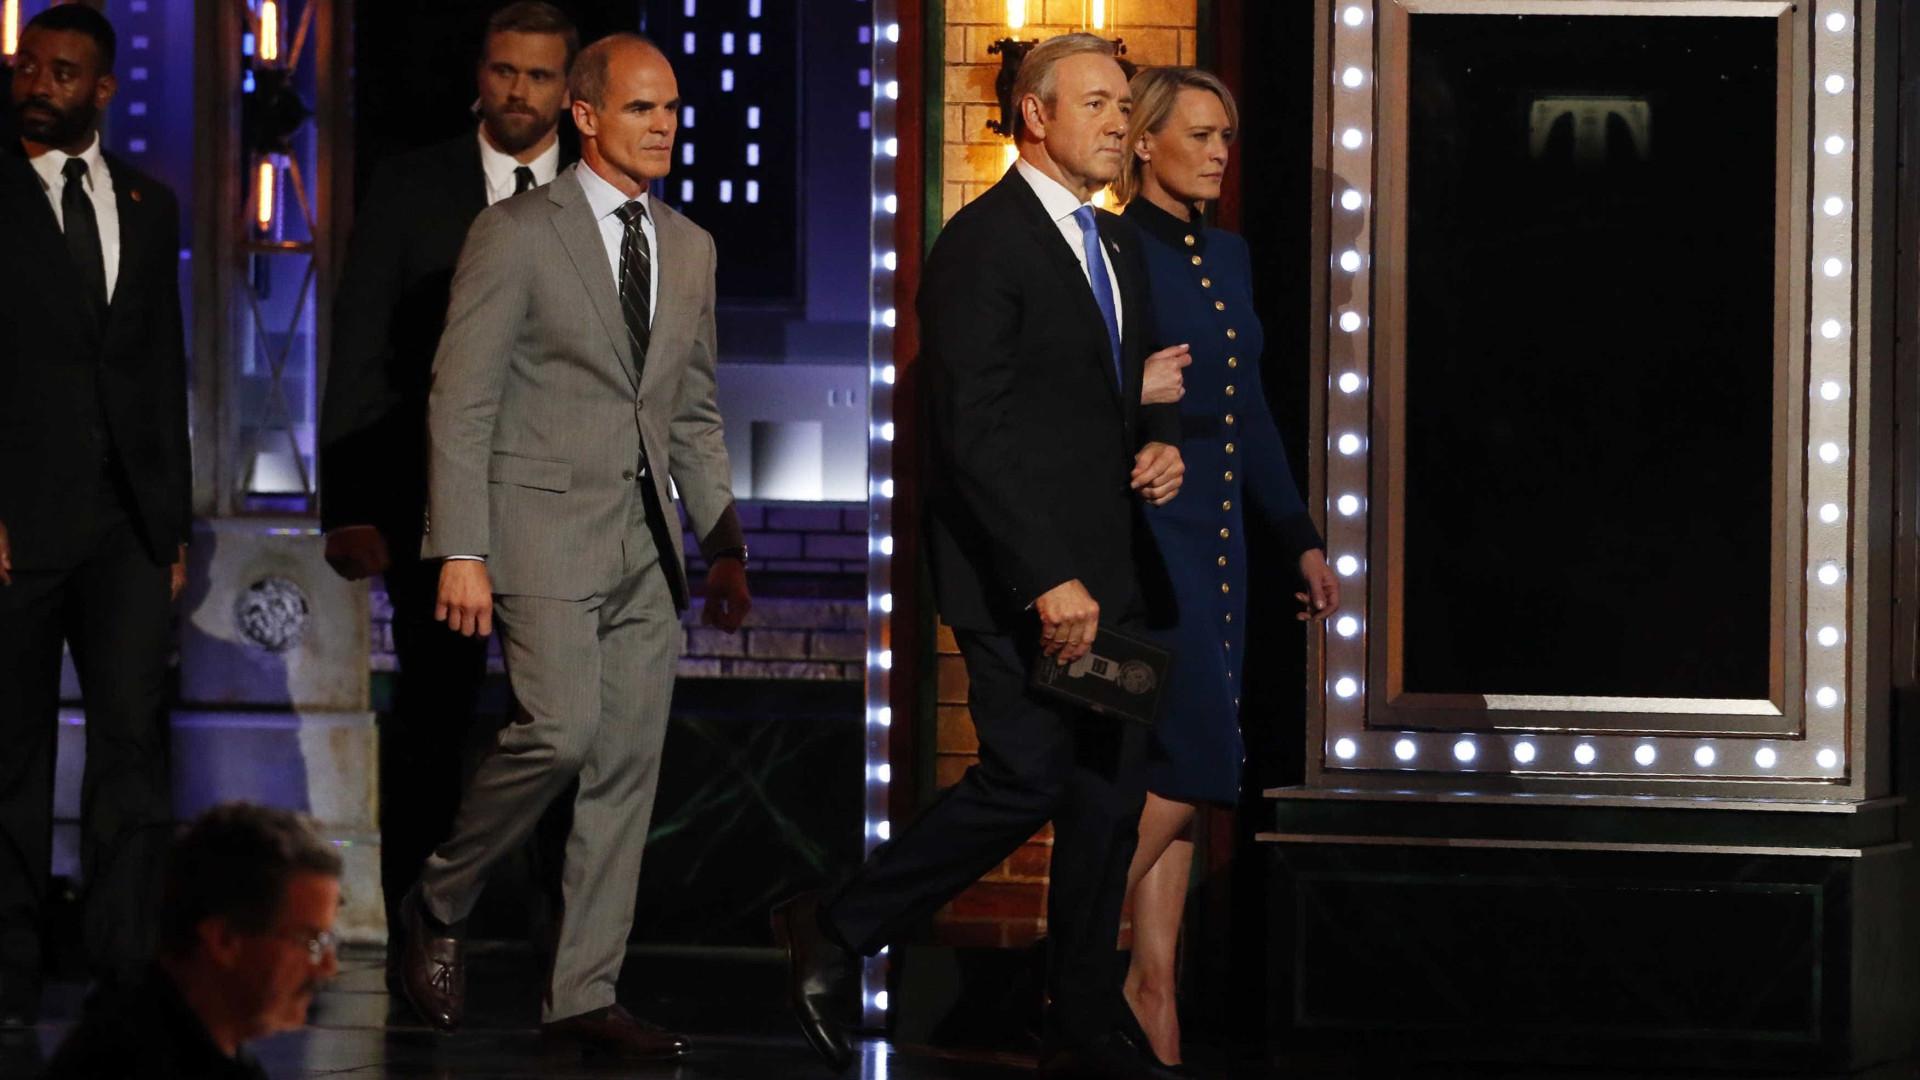 'House of Cards' retomará produção sem Kevin Spacey